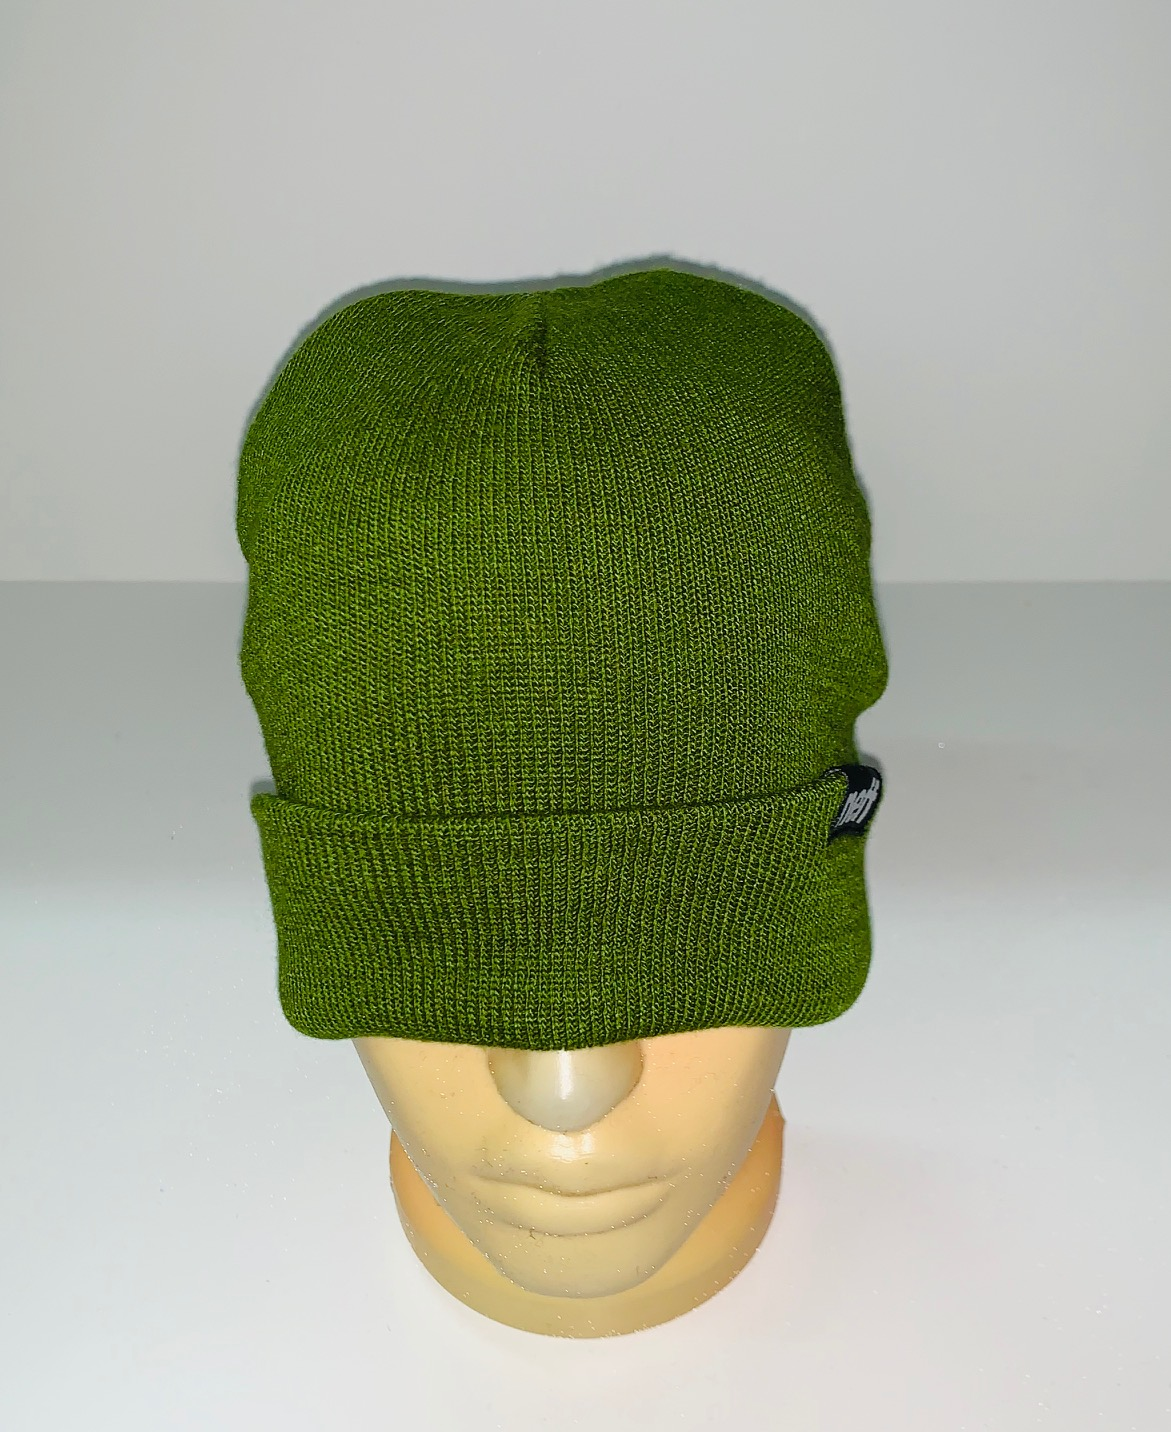 Крутая сочно-зеленая шапка